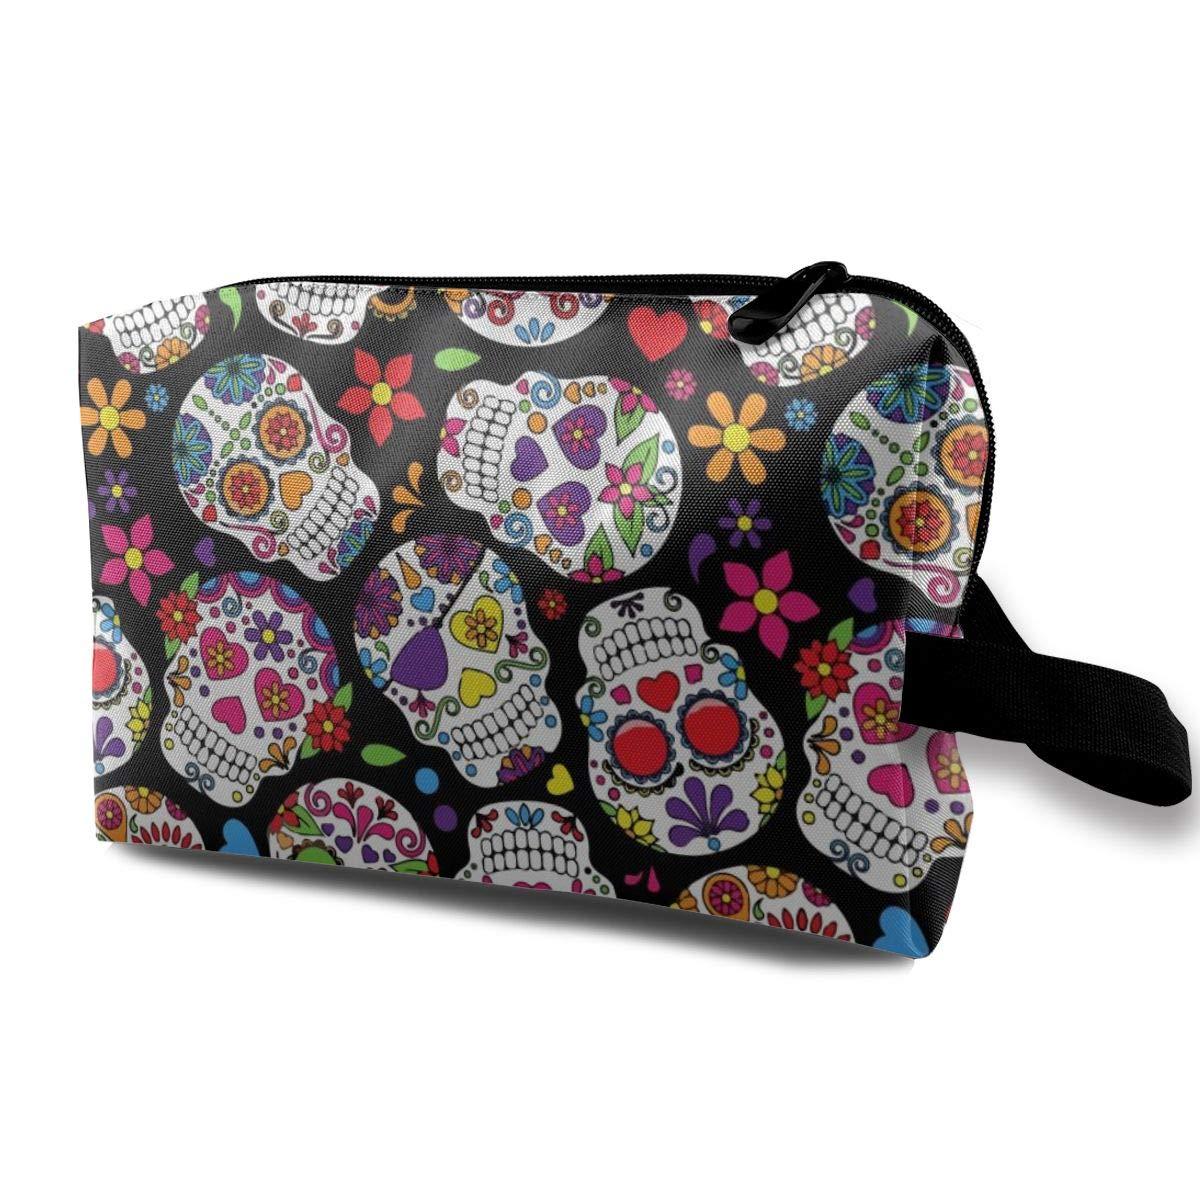 Students Super Large Capacity Canvas Pencil Case Pen Bag Pouch Stationary Case Makeup Cosmetic Bag (Dead Sugar Skull)